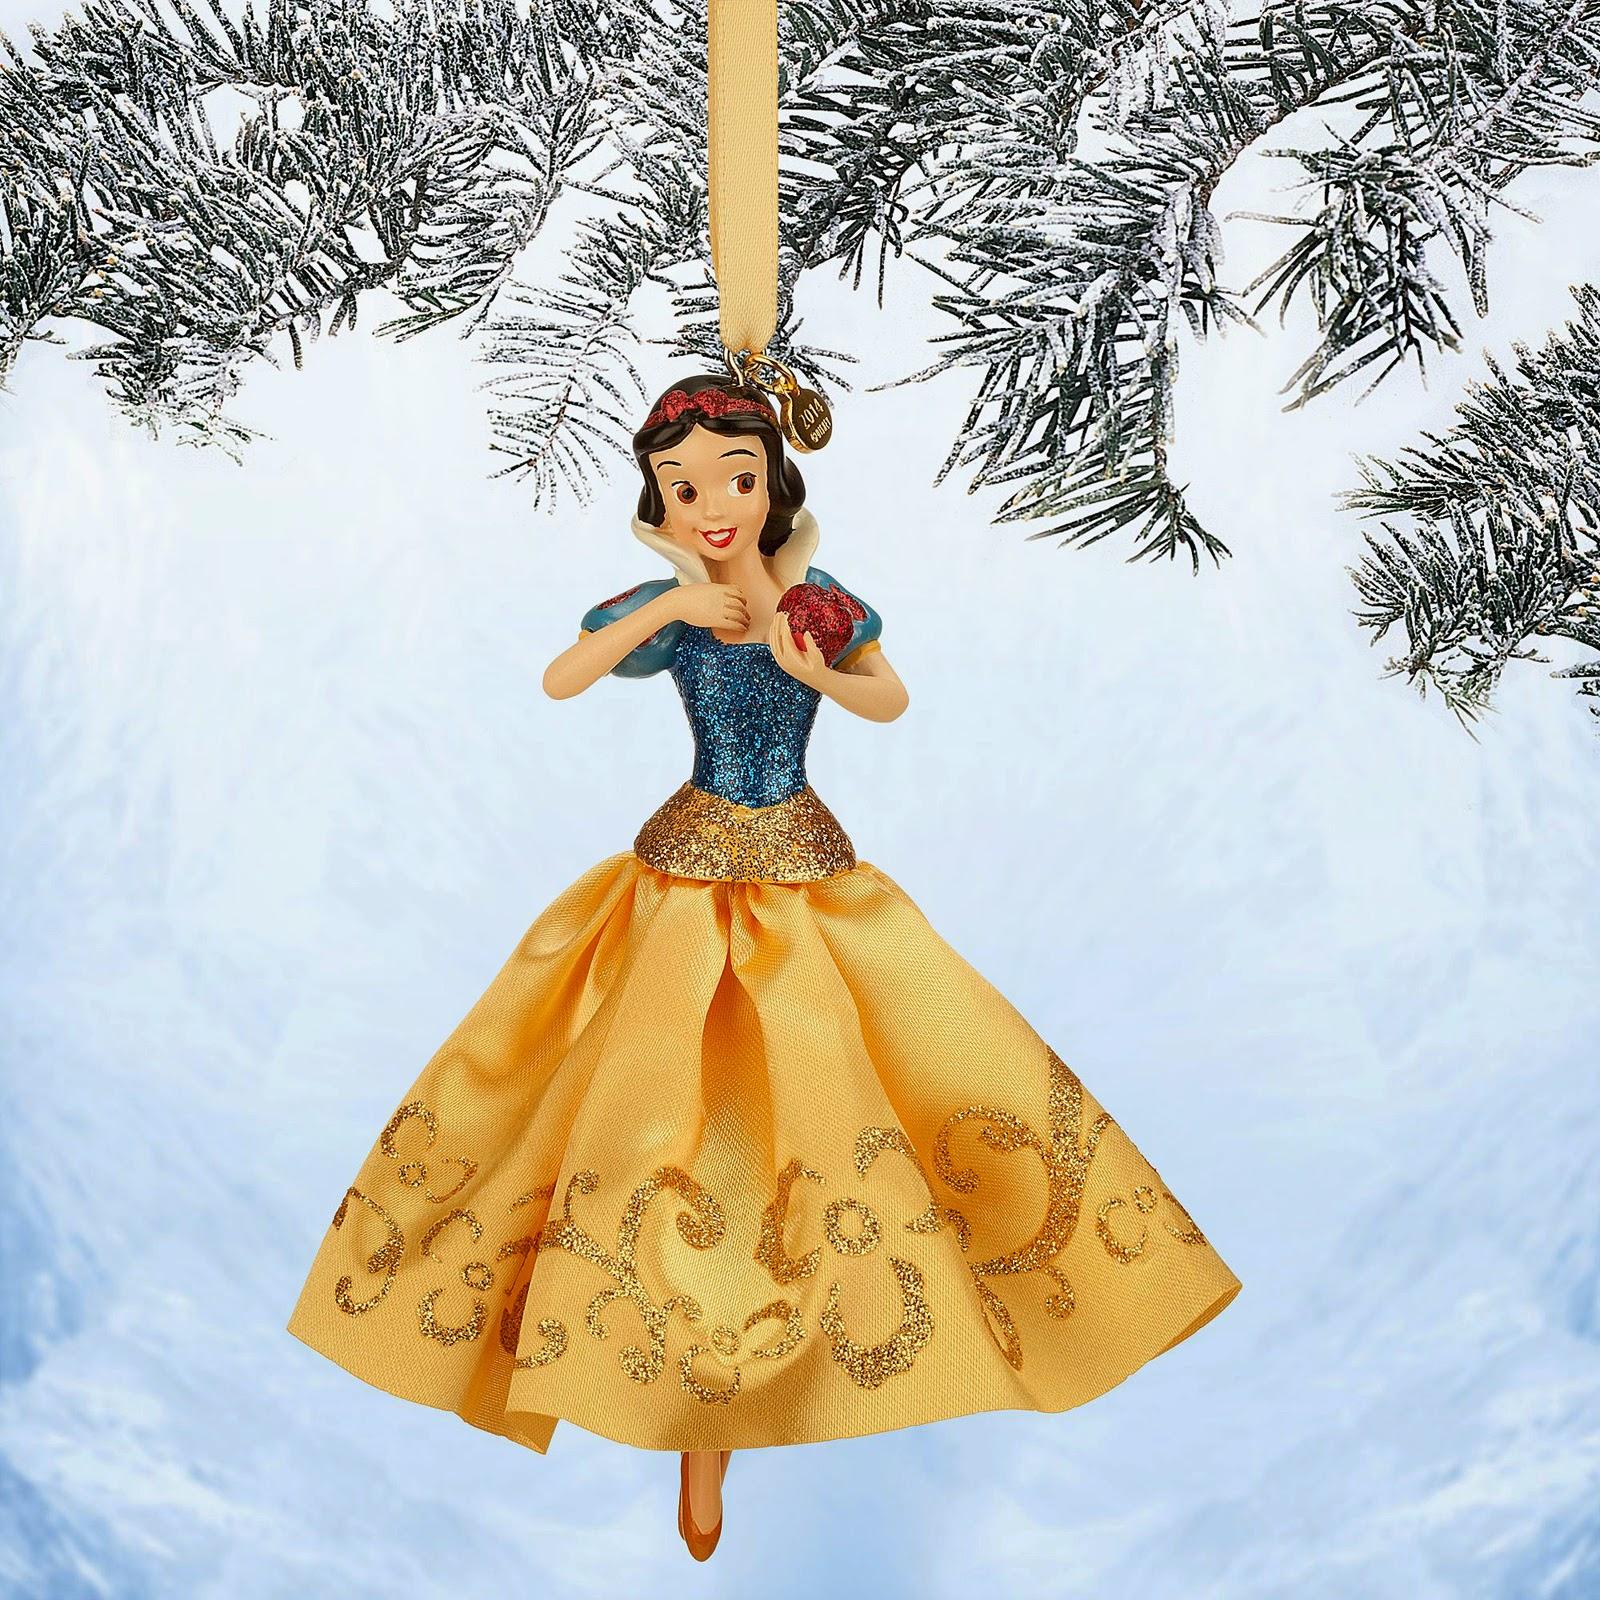 Filmic Light - Snow White Archive: Disney Store 'Snow ...